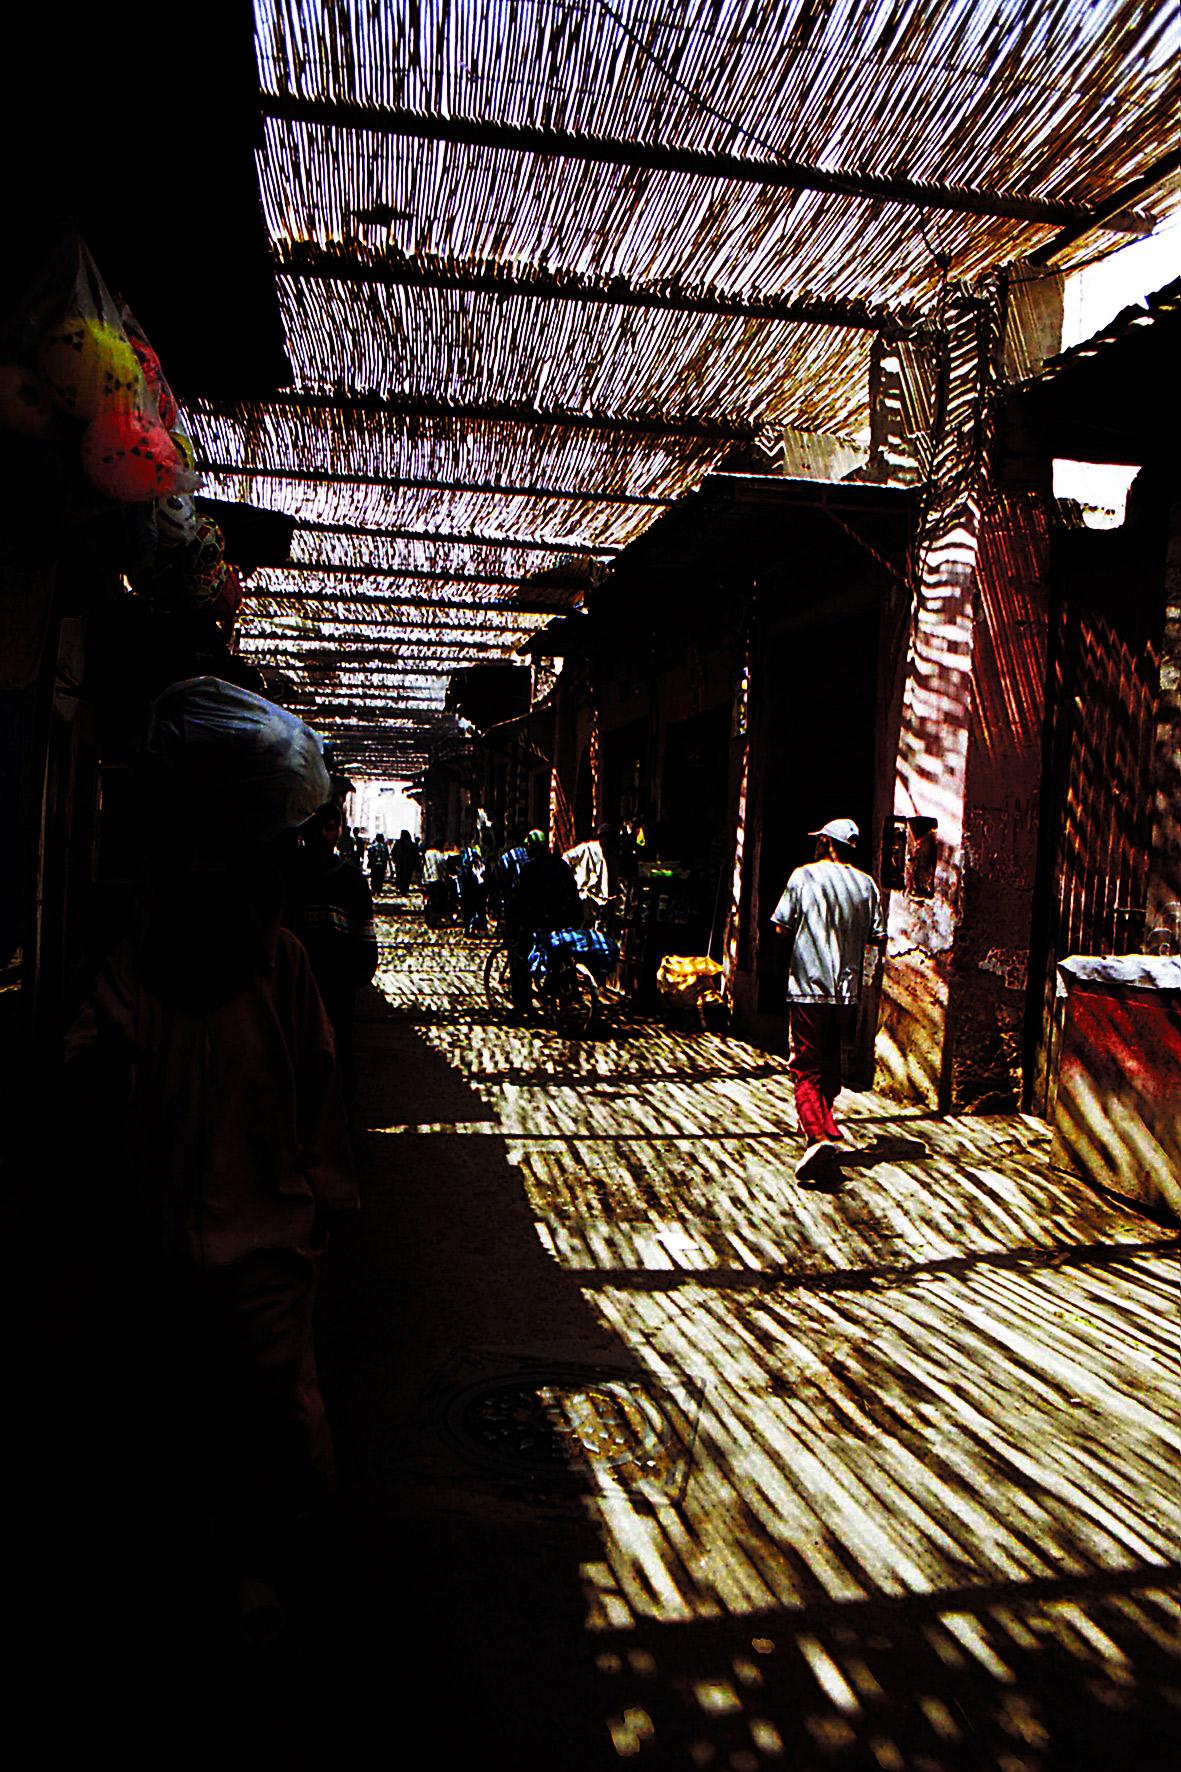 Maroc, Marrakech. 2004